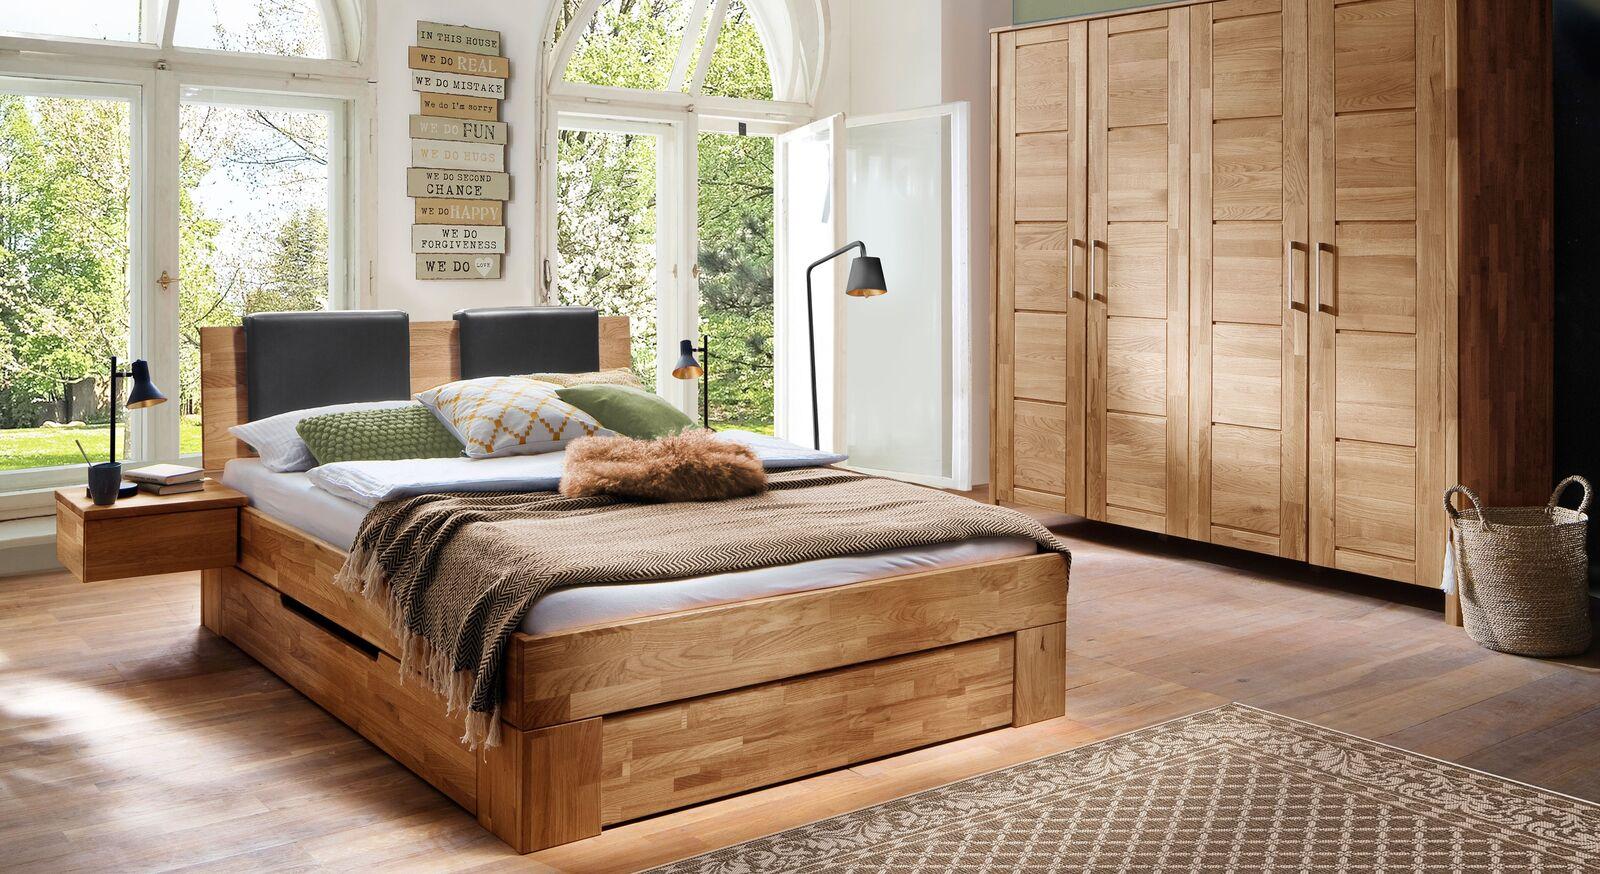 Passende Produkte zum Schubkasten-Bett Pasja